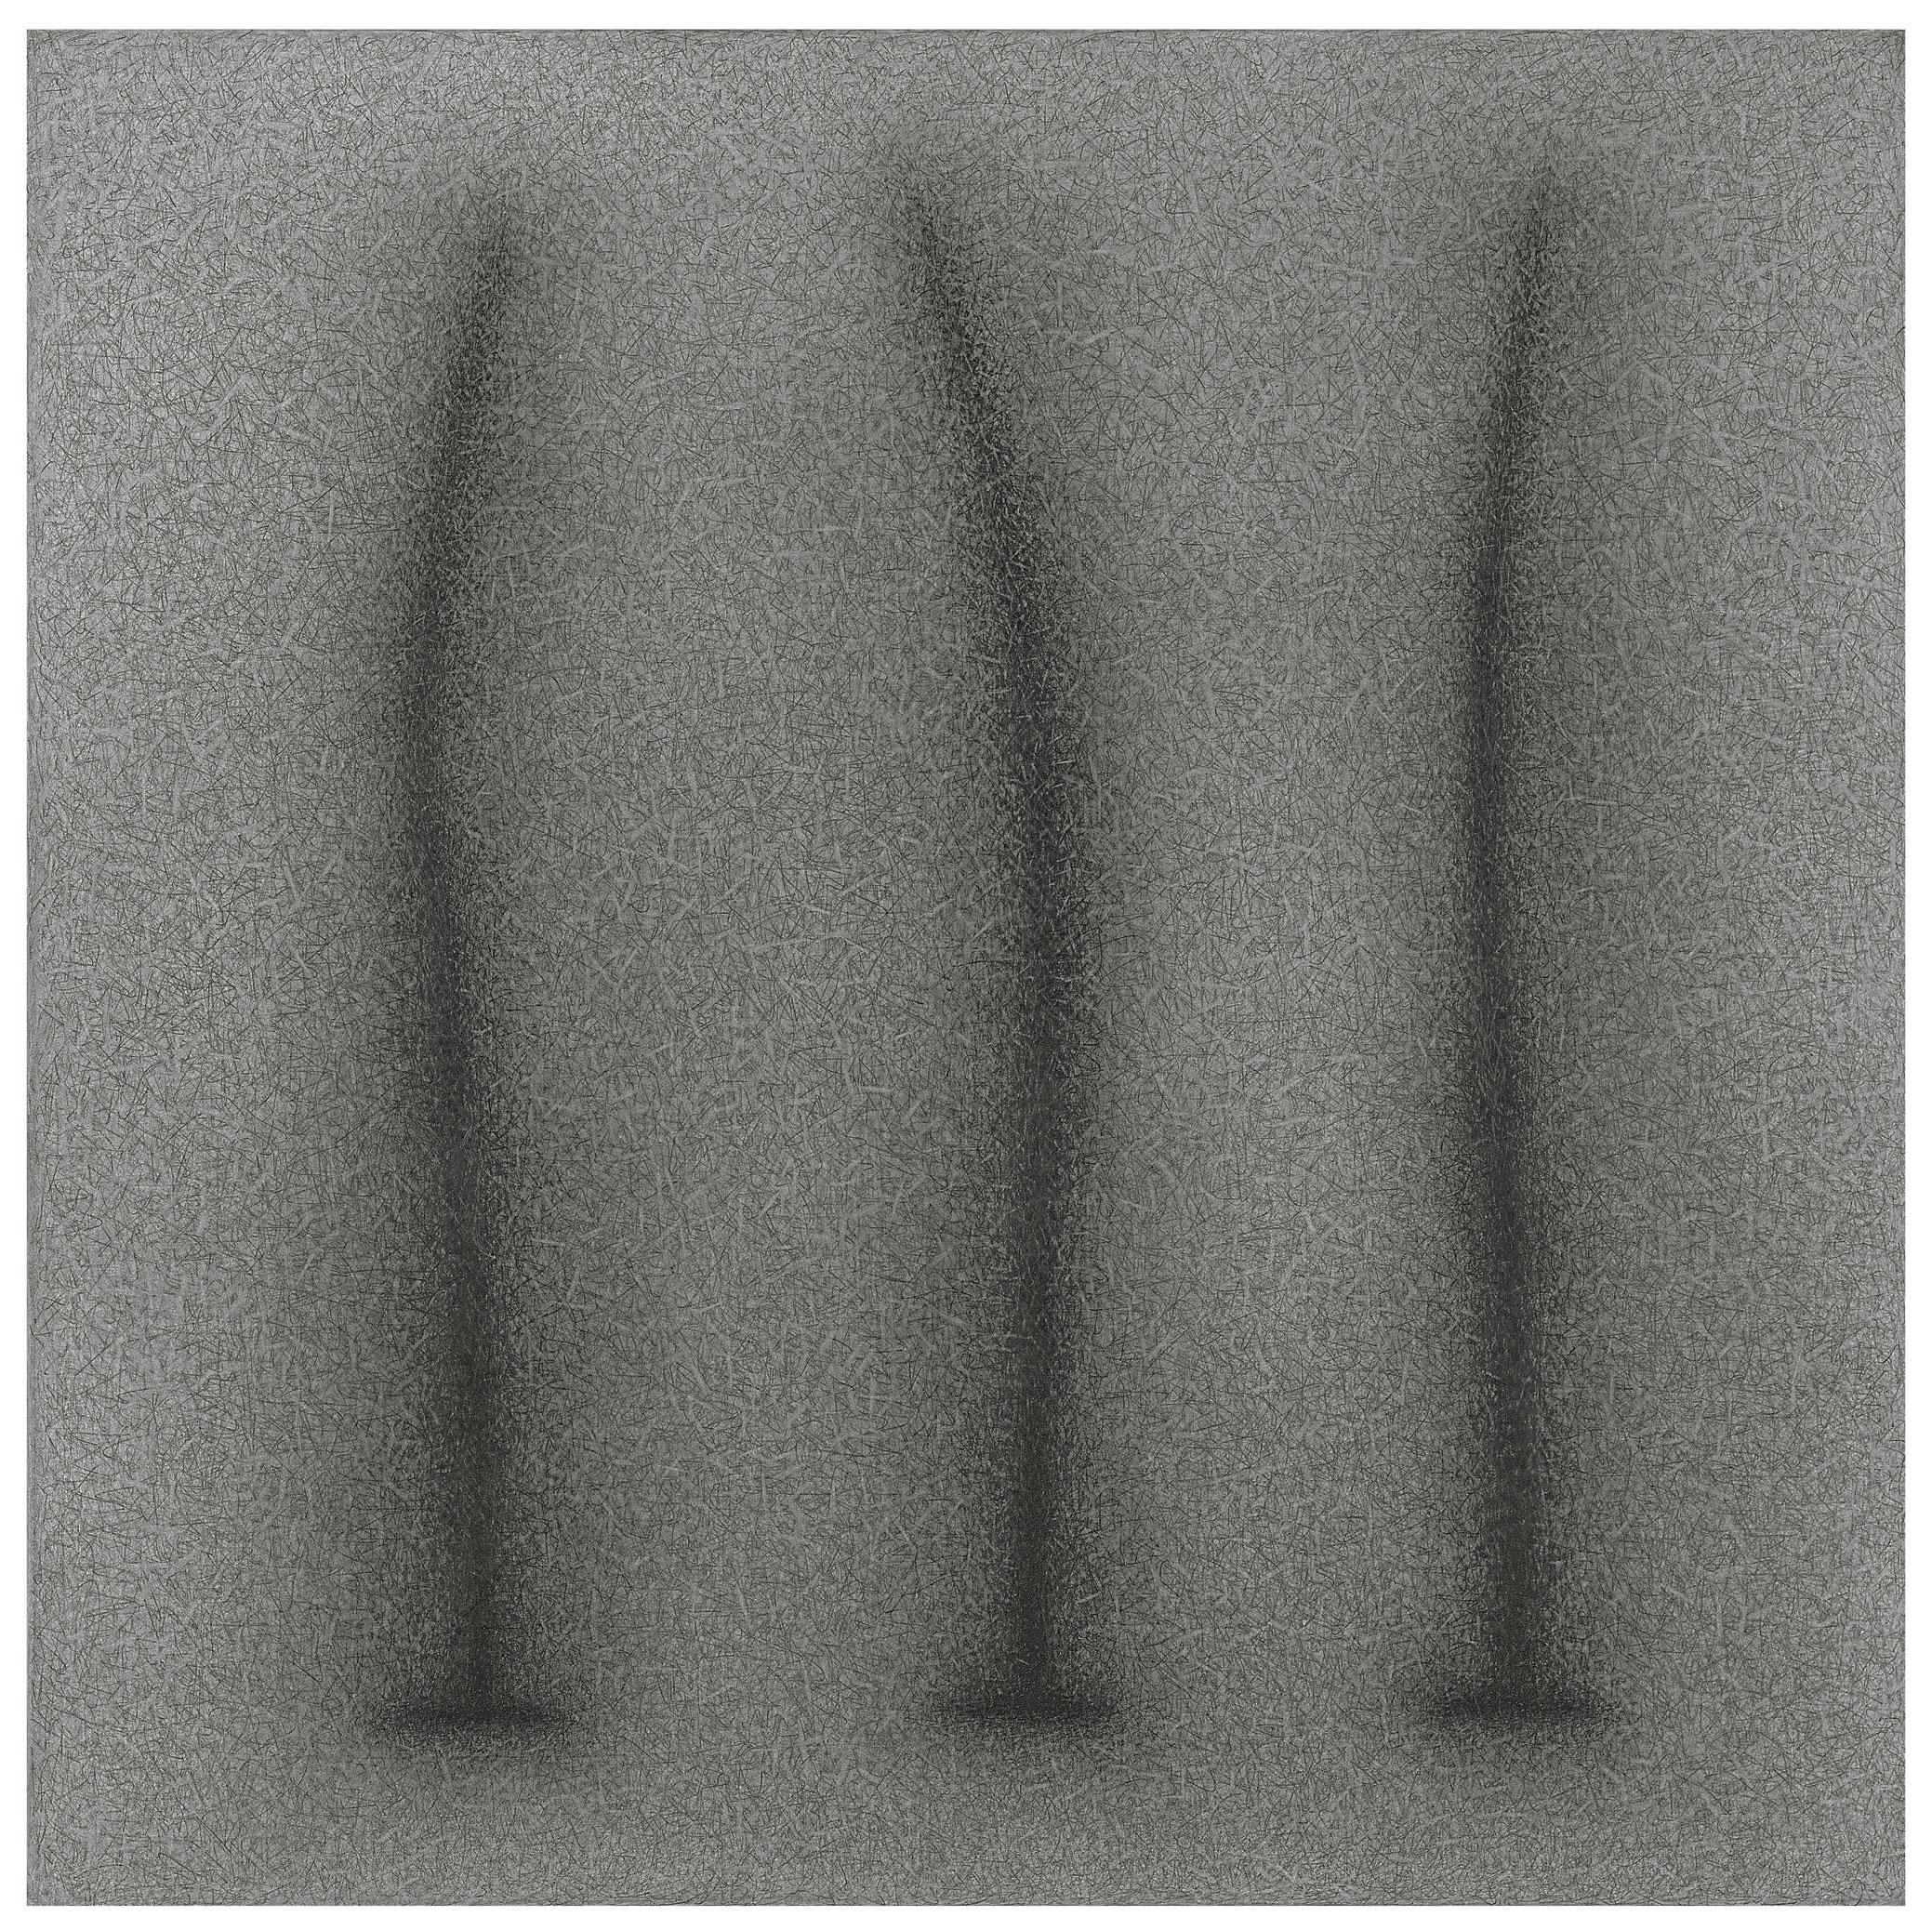 Three Nails